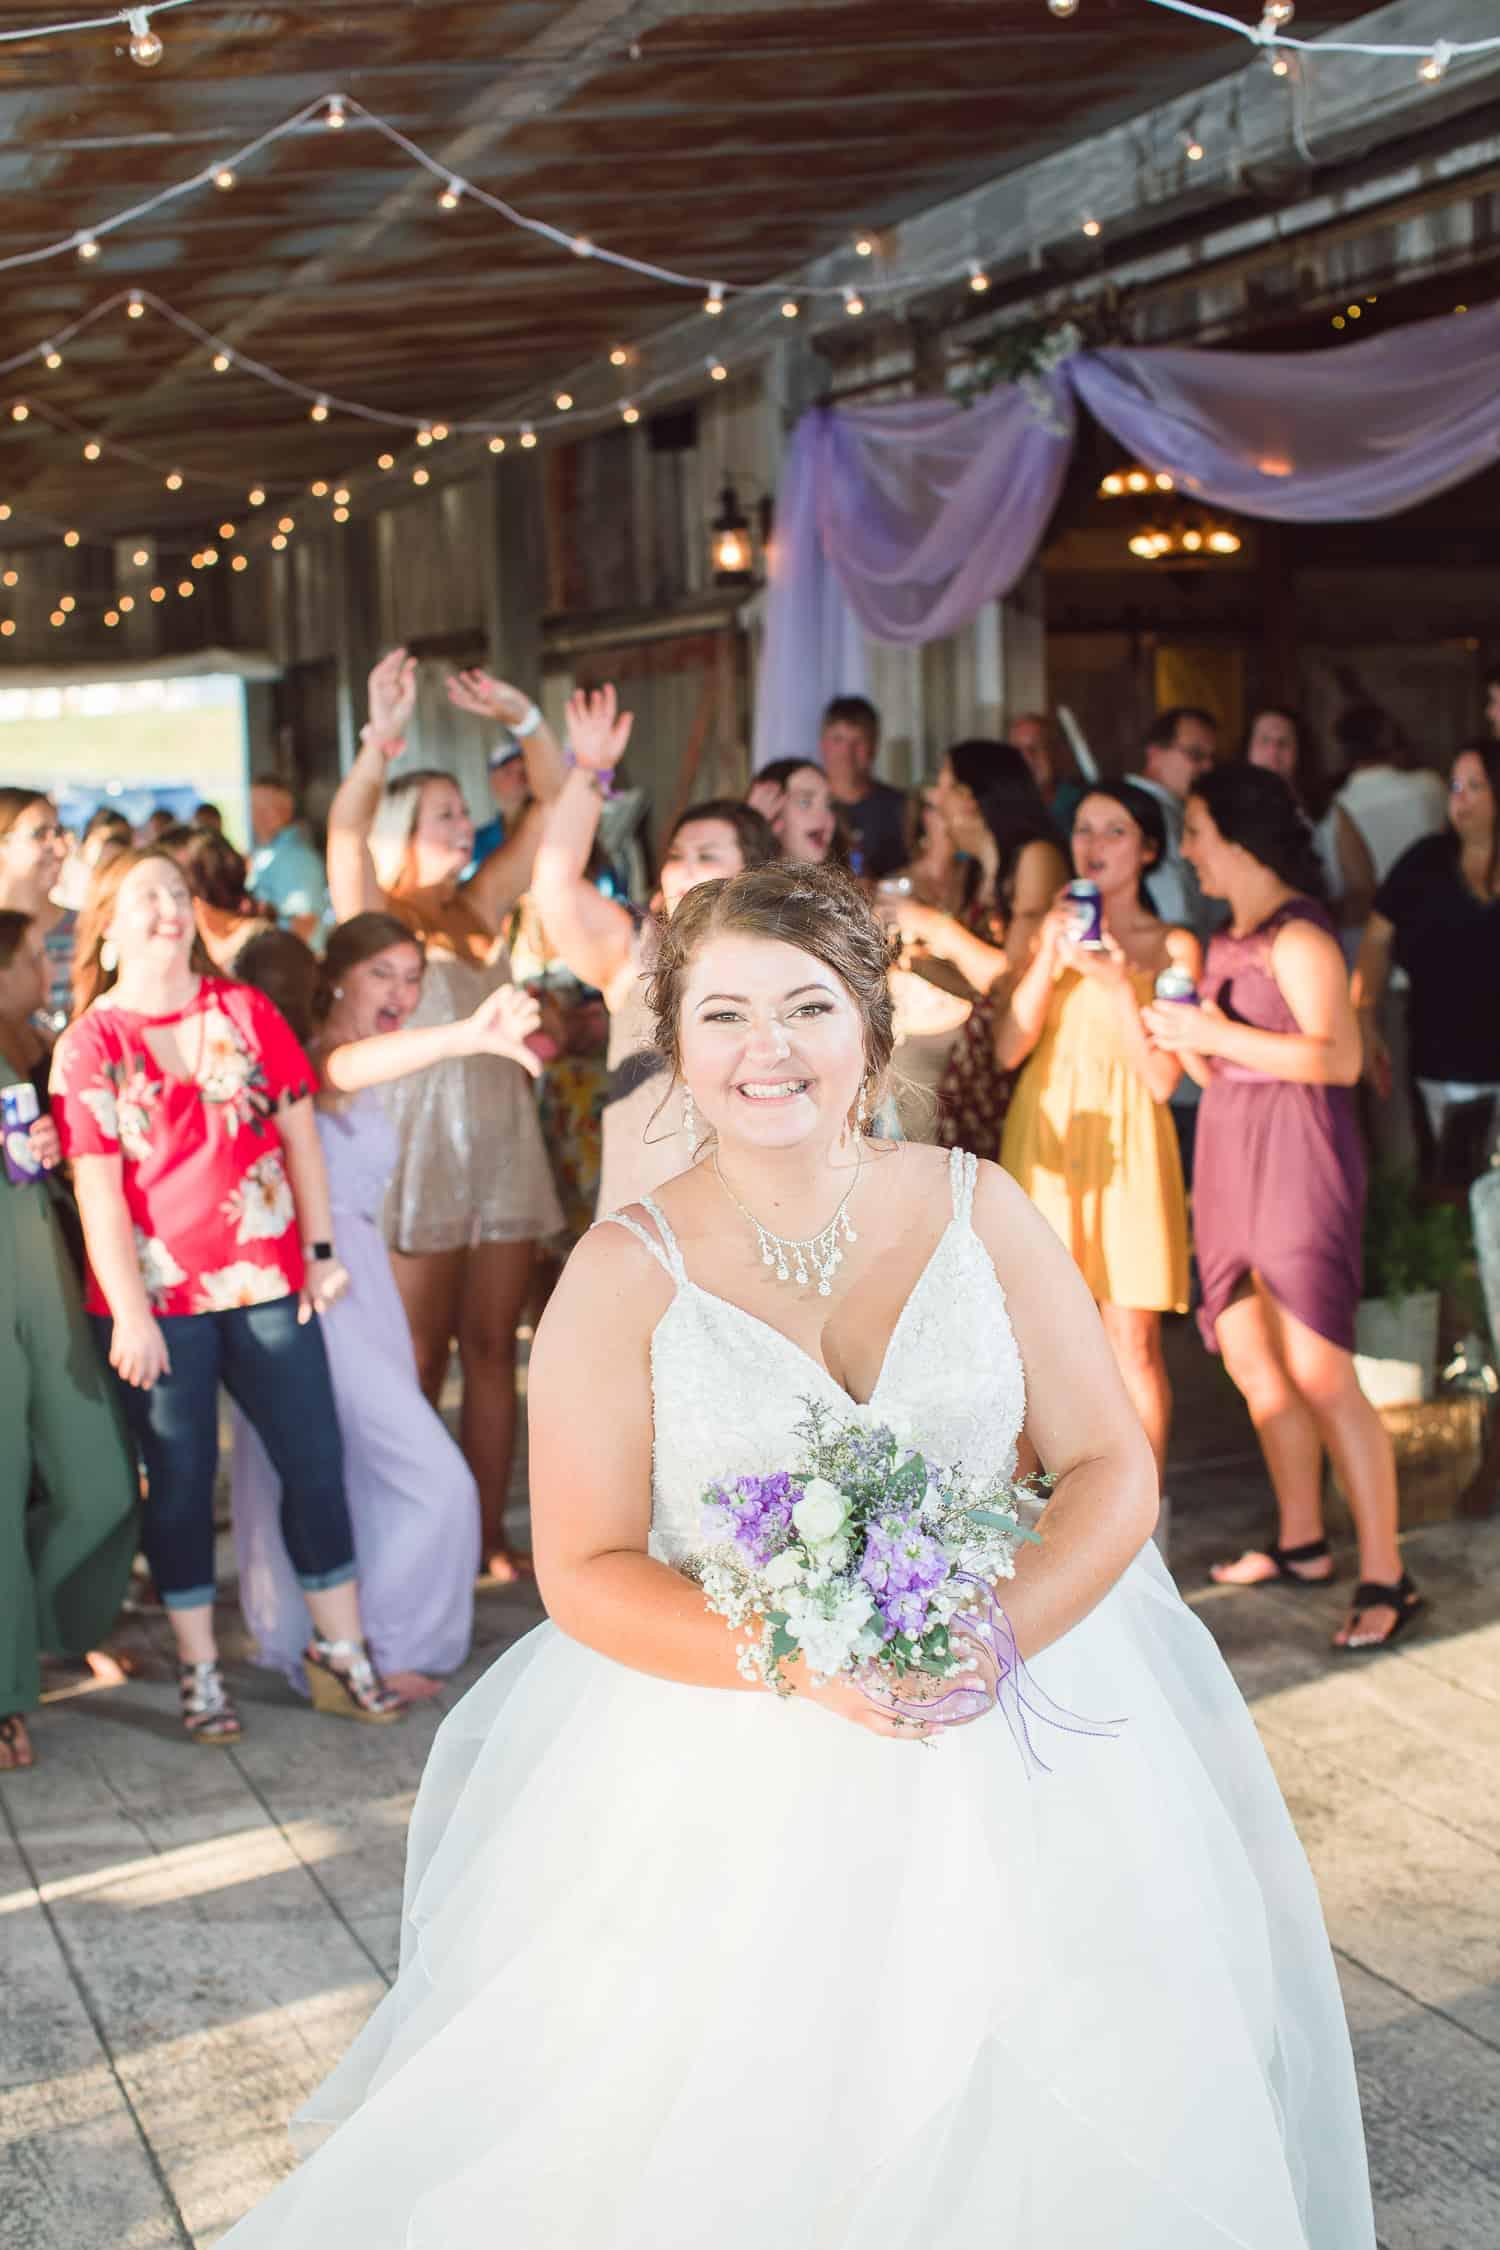 Outdoor barn wedding in Missouri